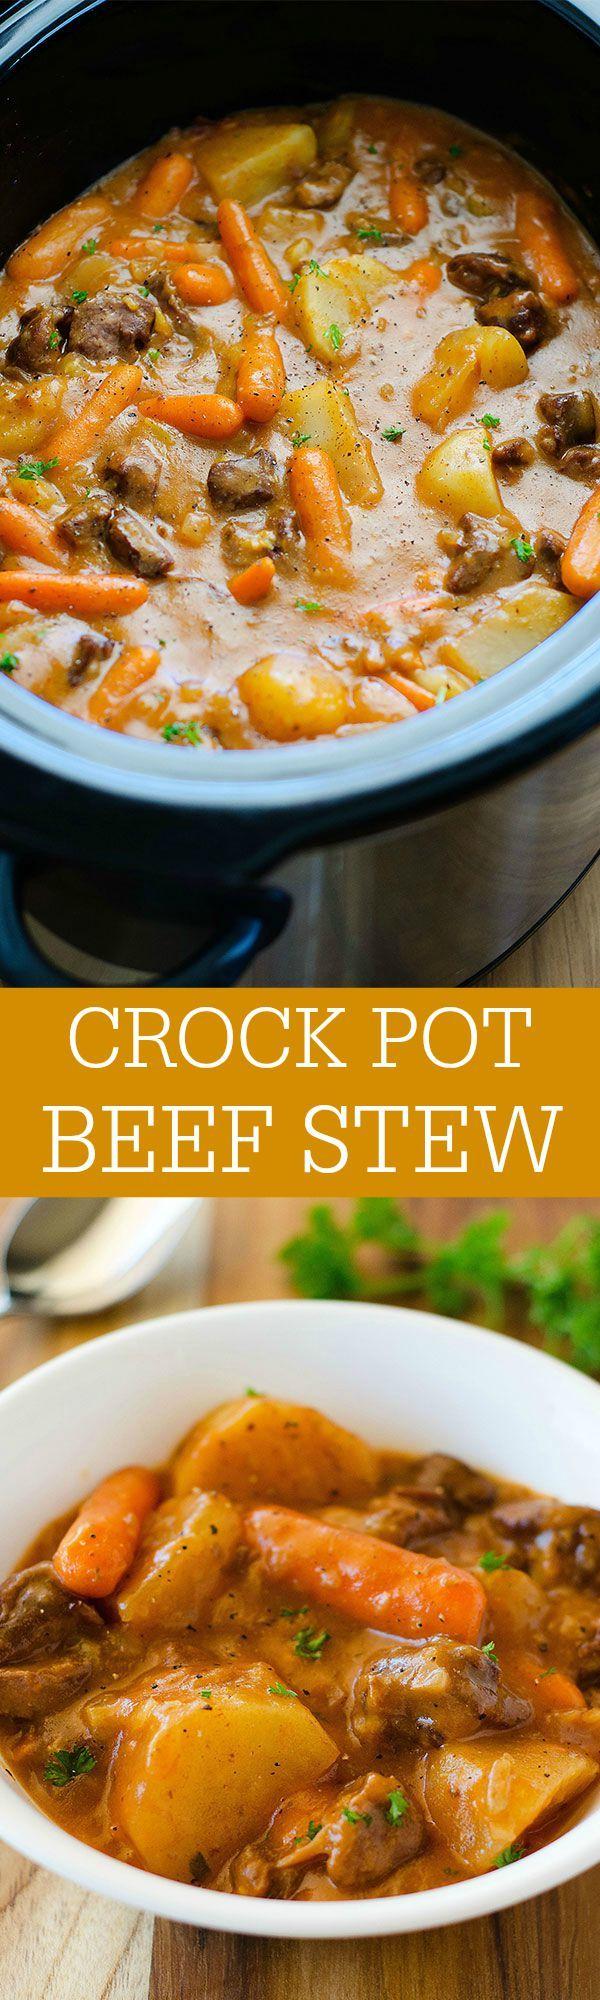 2 (1 oz) packages dry onion soup mix 1/2 teaspoon paprika 2 pounds lean beef stew